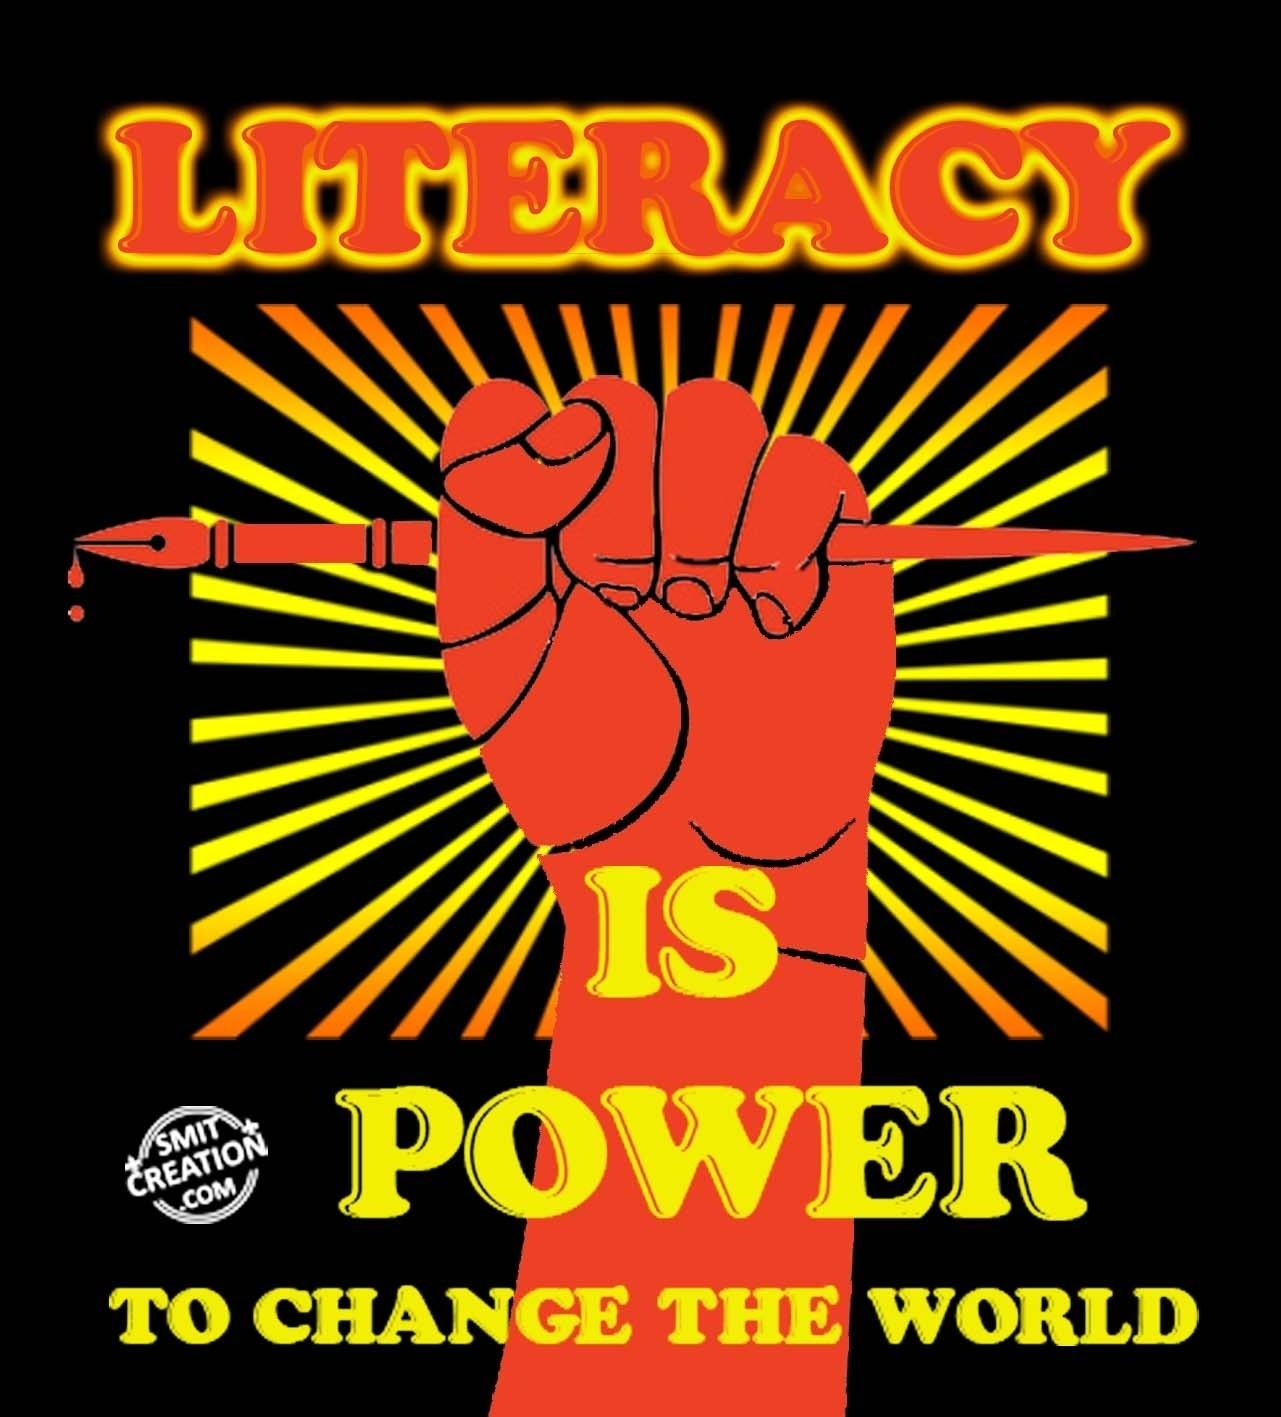 LITERACY IS POWER TO CHANGE THE WORLD - SmitCreation.com